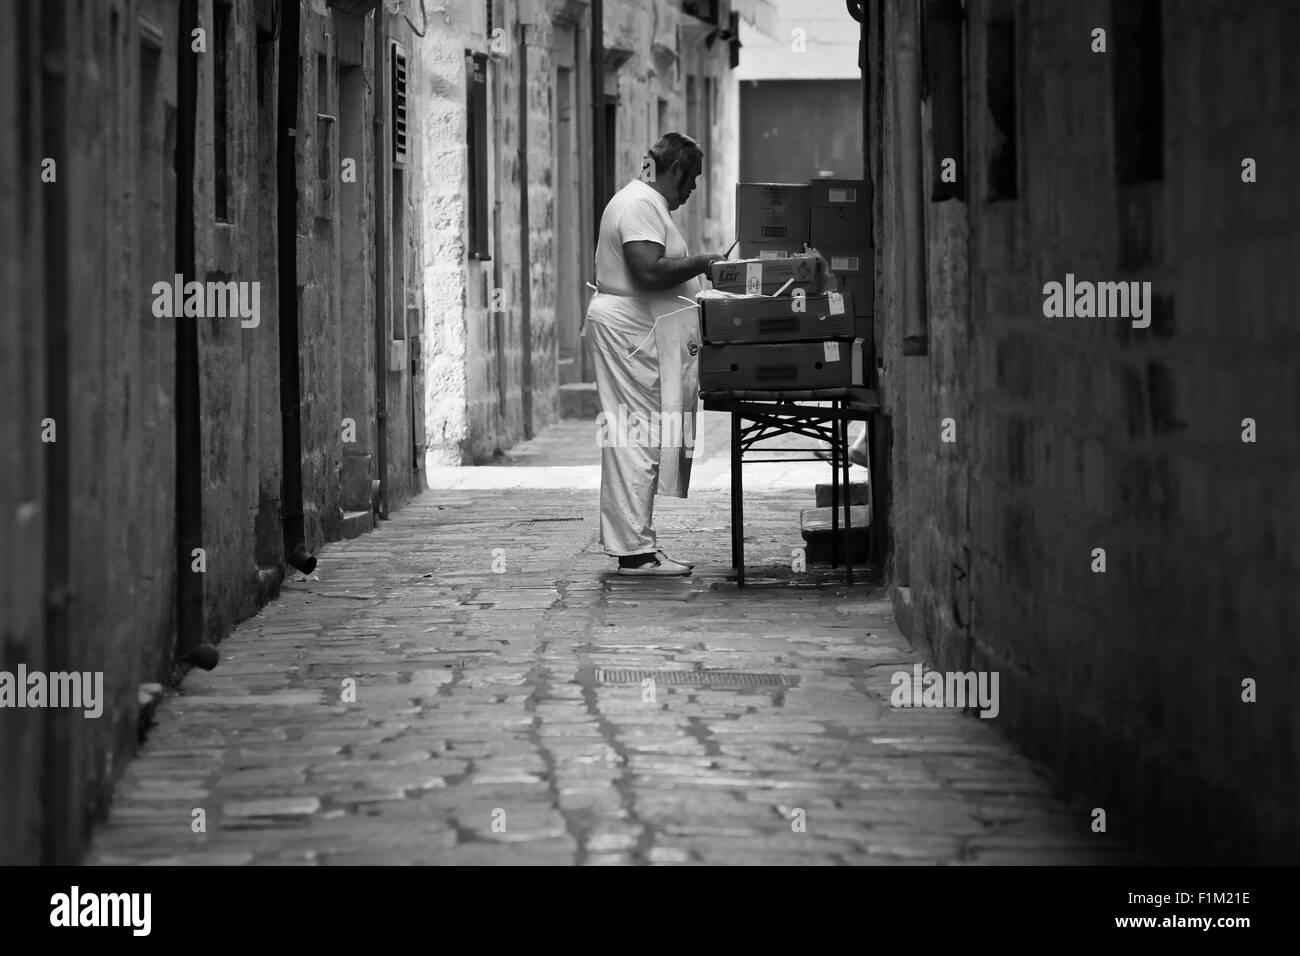 Cook masterchef, Dubrovnik, Croatia - Stock Image